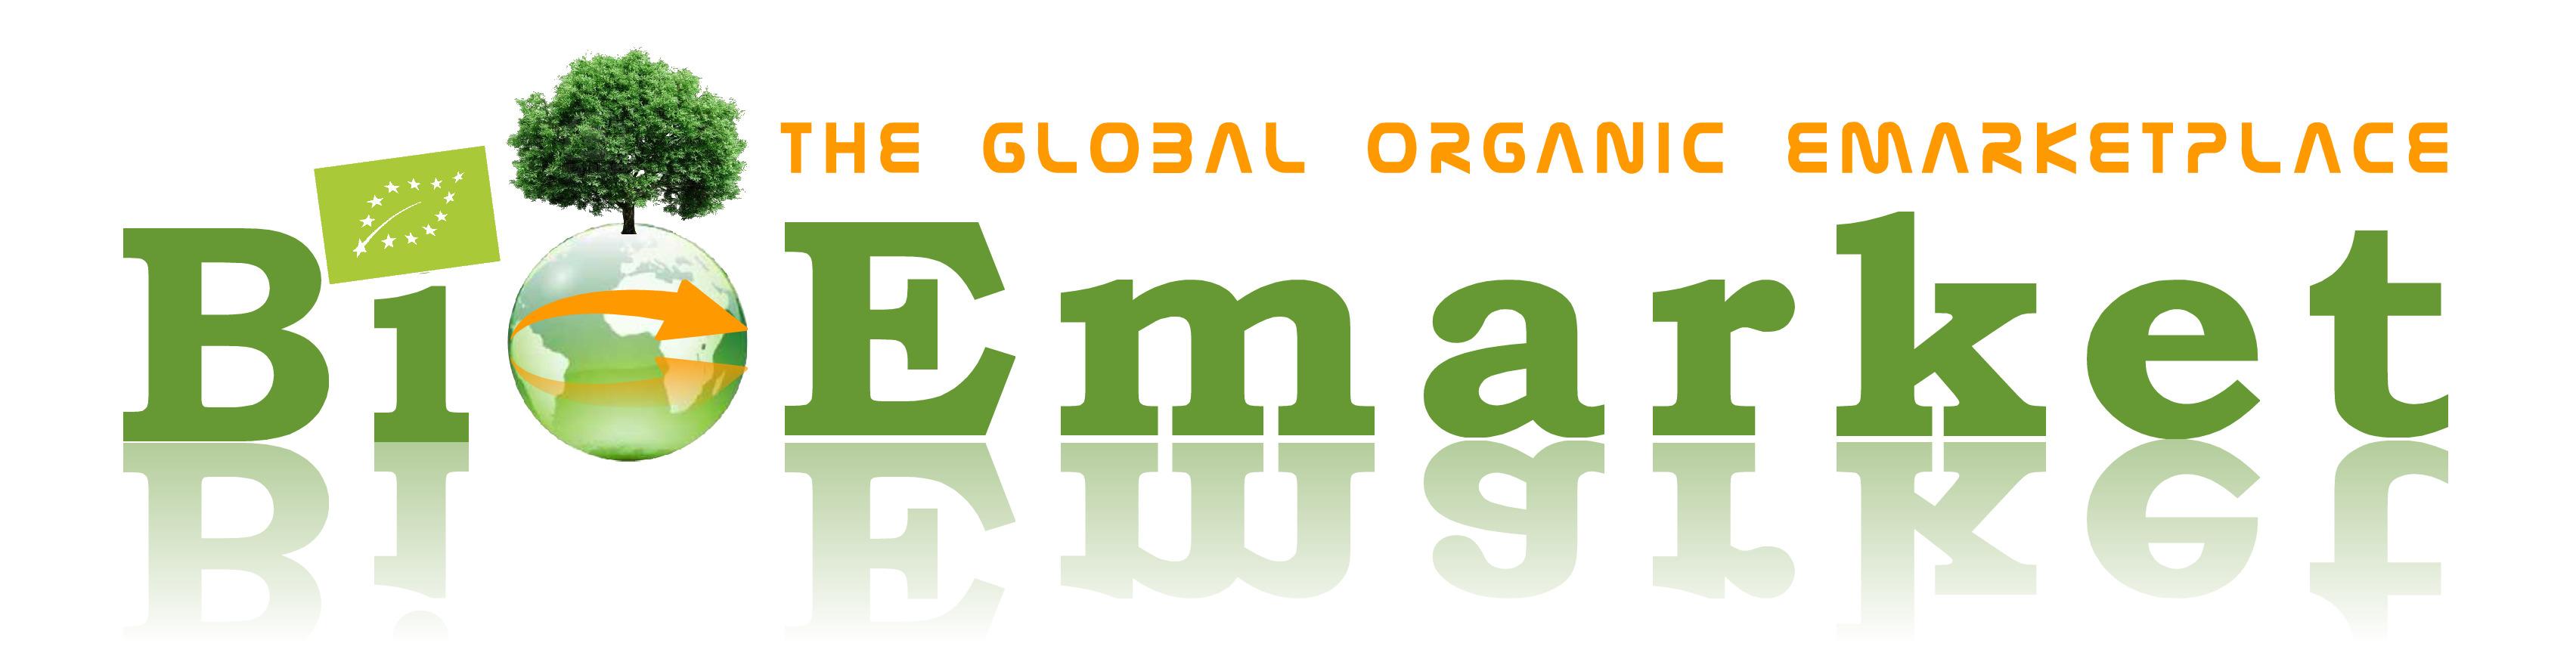 BioEmarket supports Global Organic Market